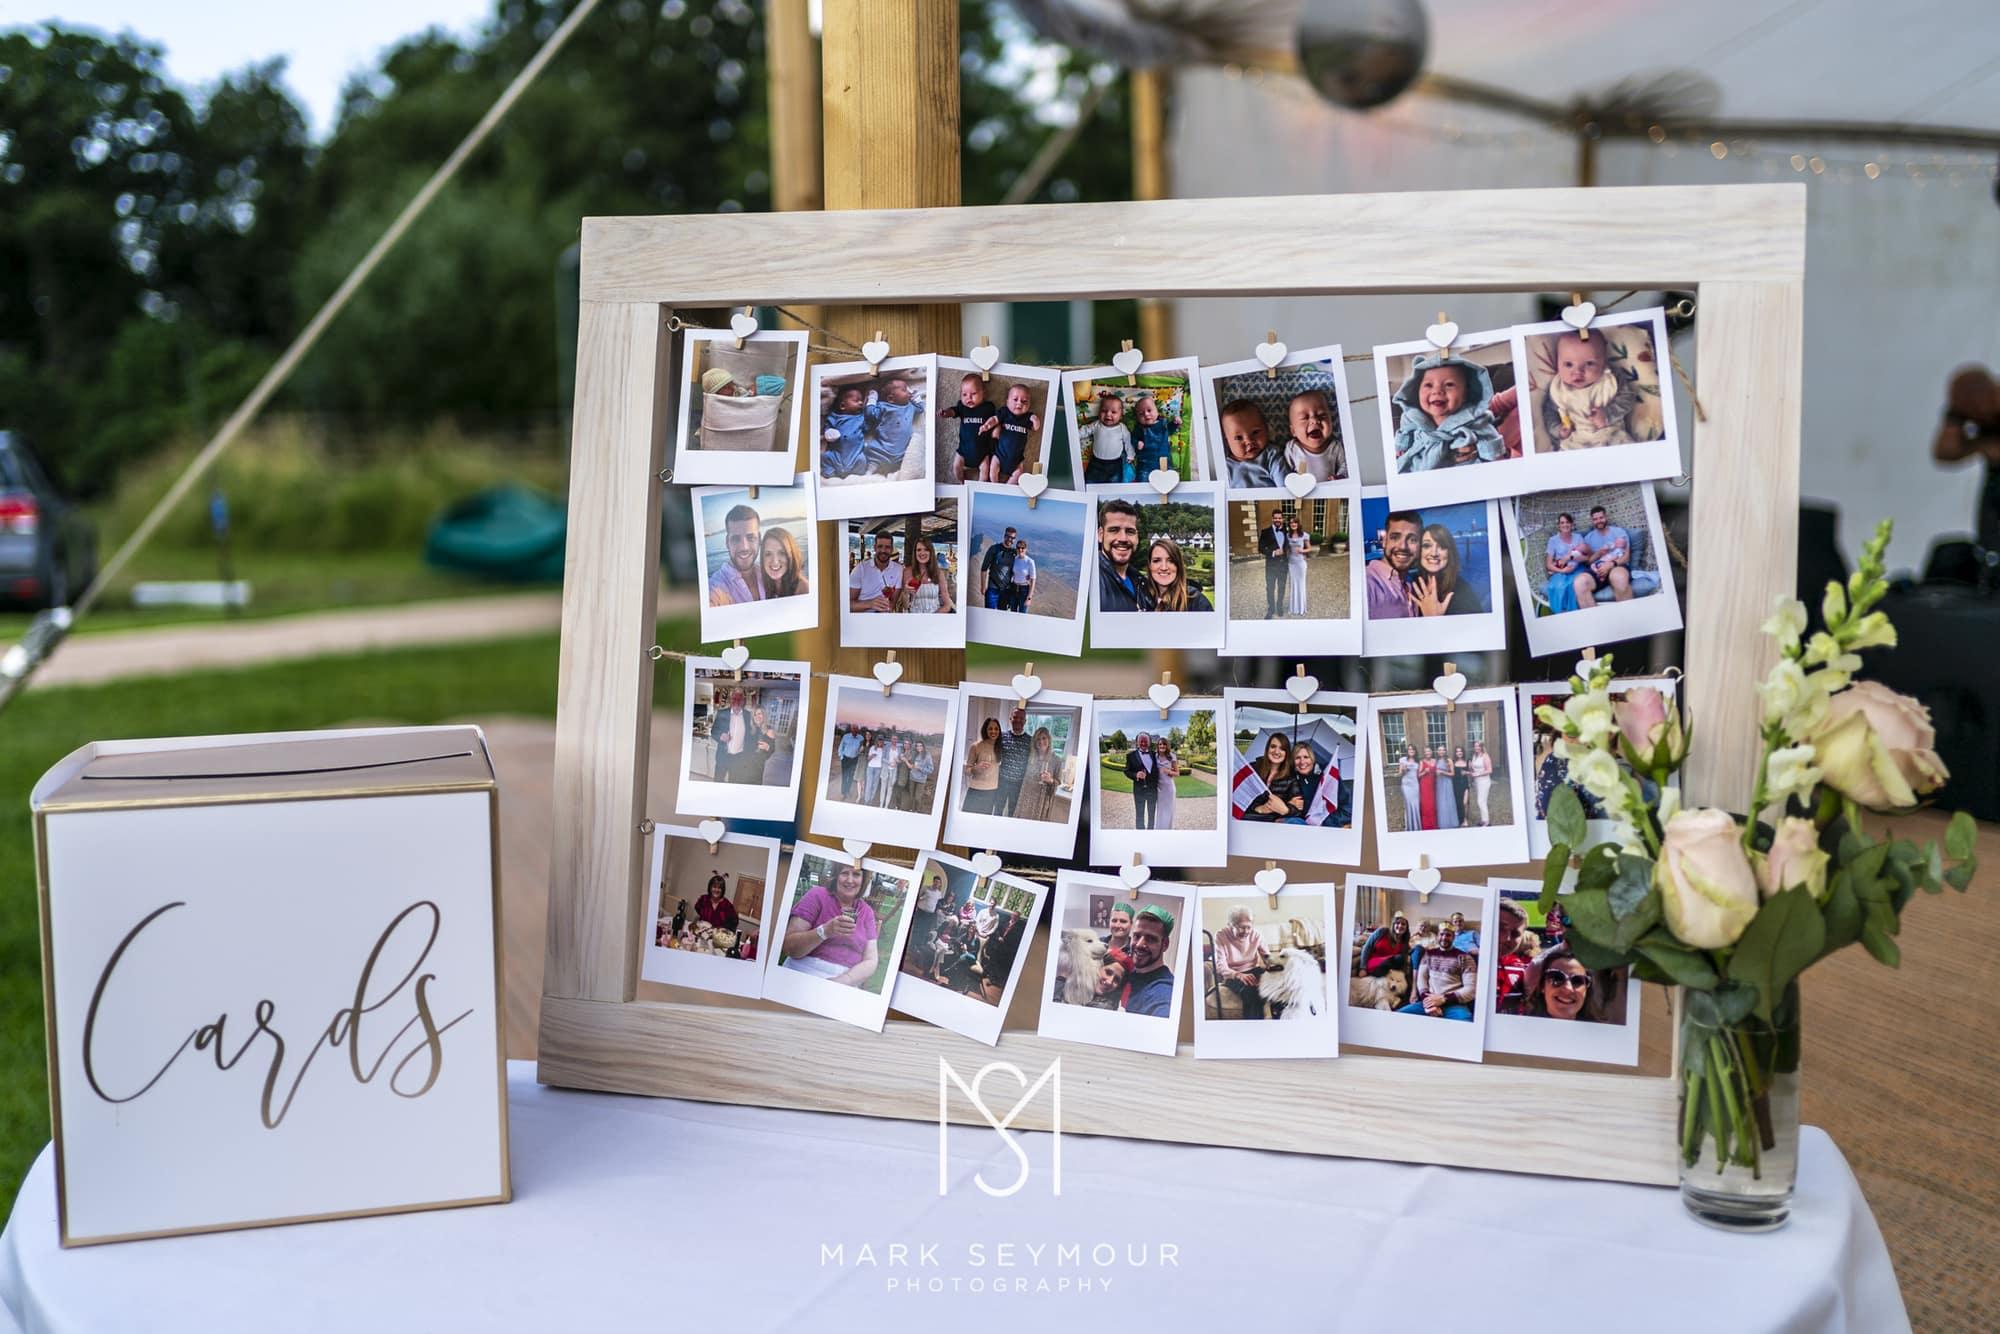 Barnsley House Wedding Photographer - Olivia and James' wedding 21